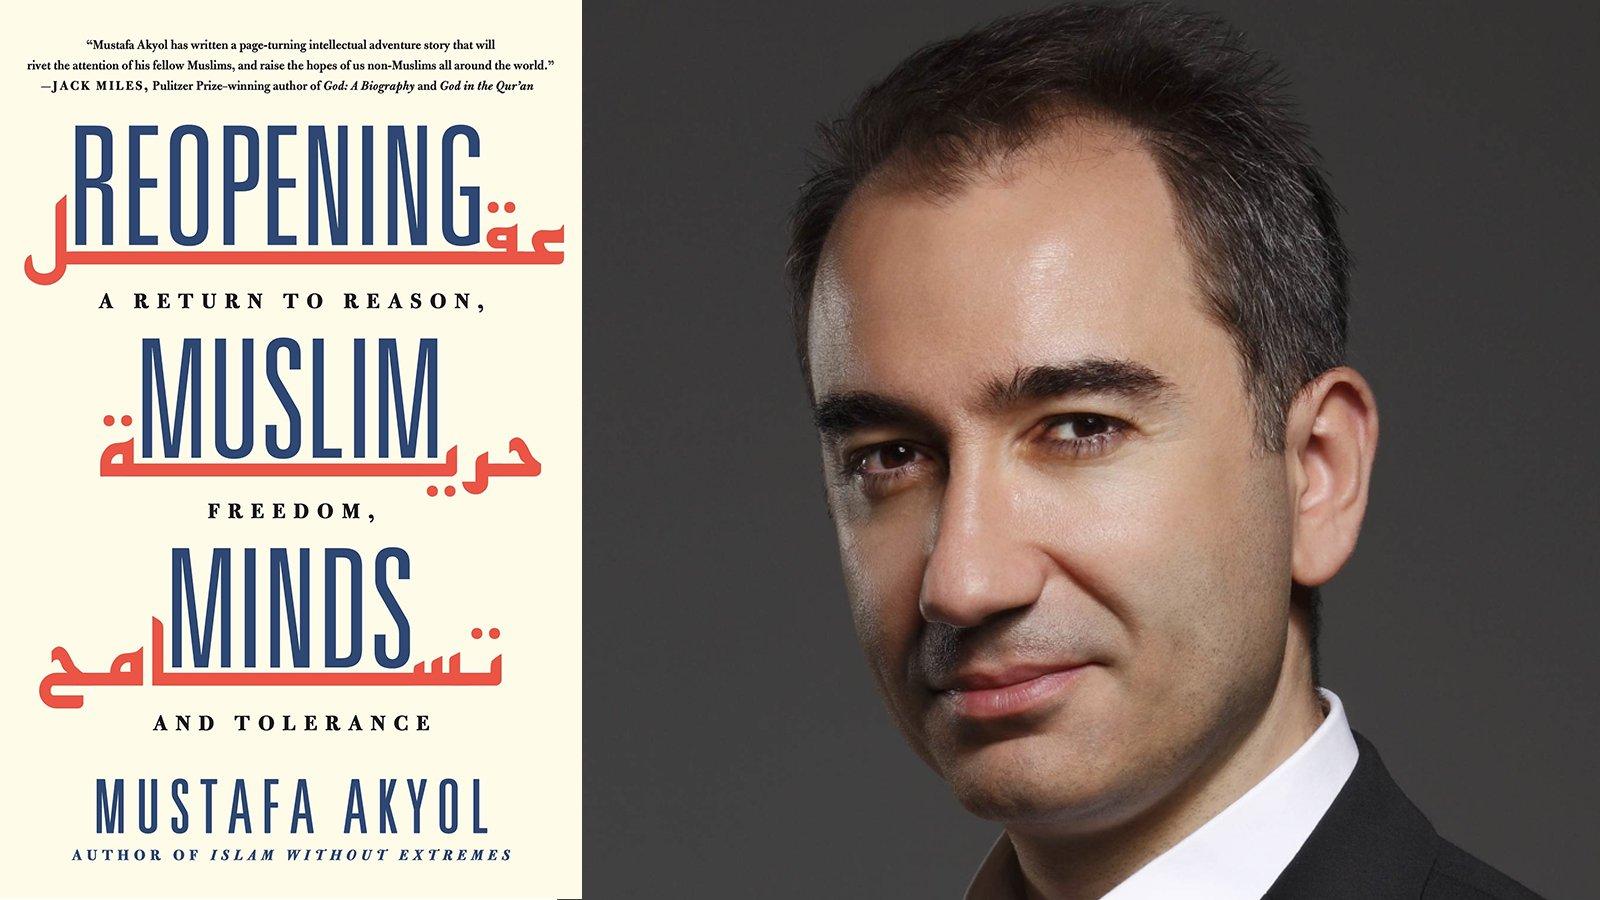 Мустафа Акйол выступает за реформу ислама изнутри